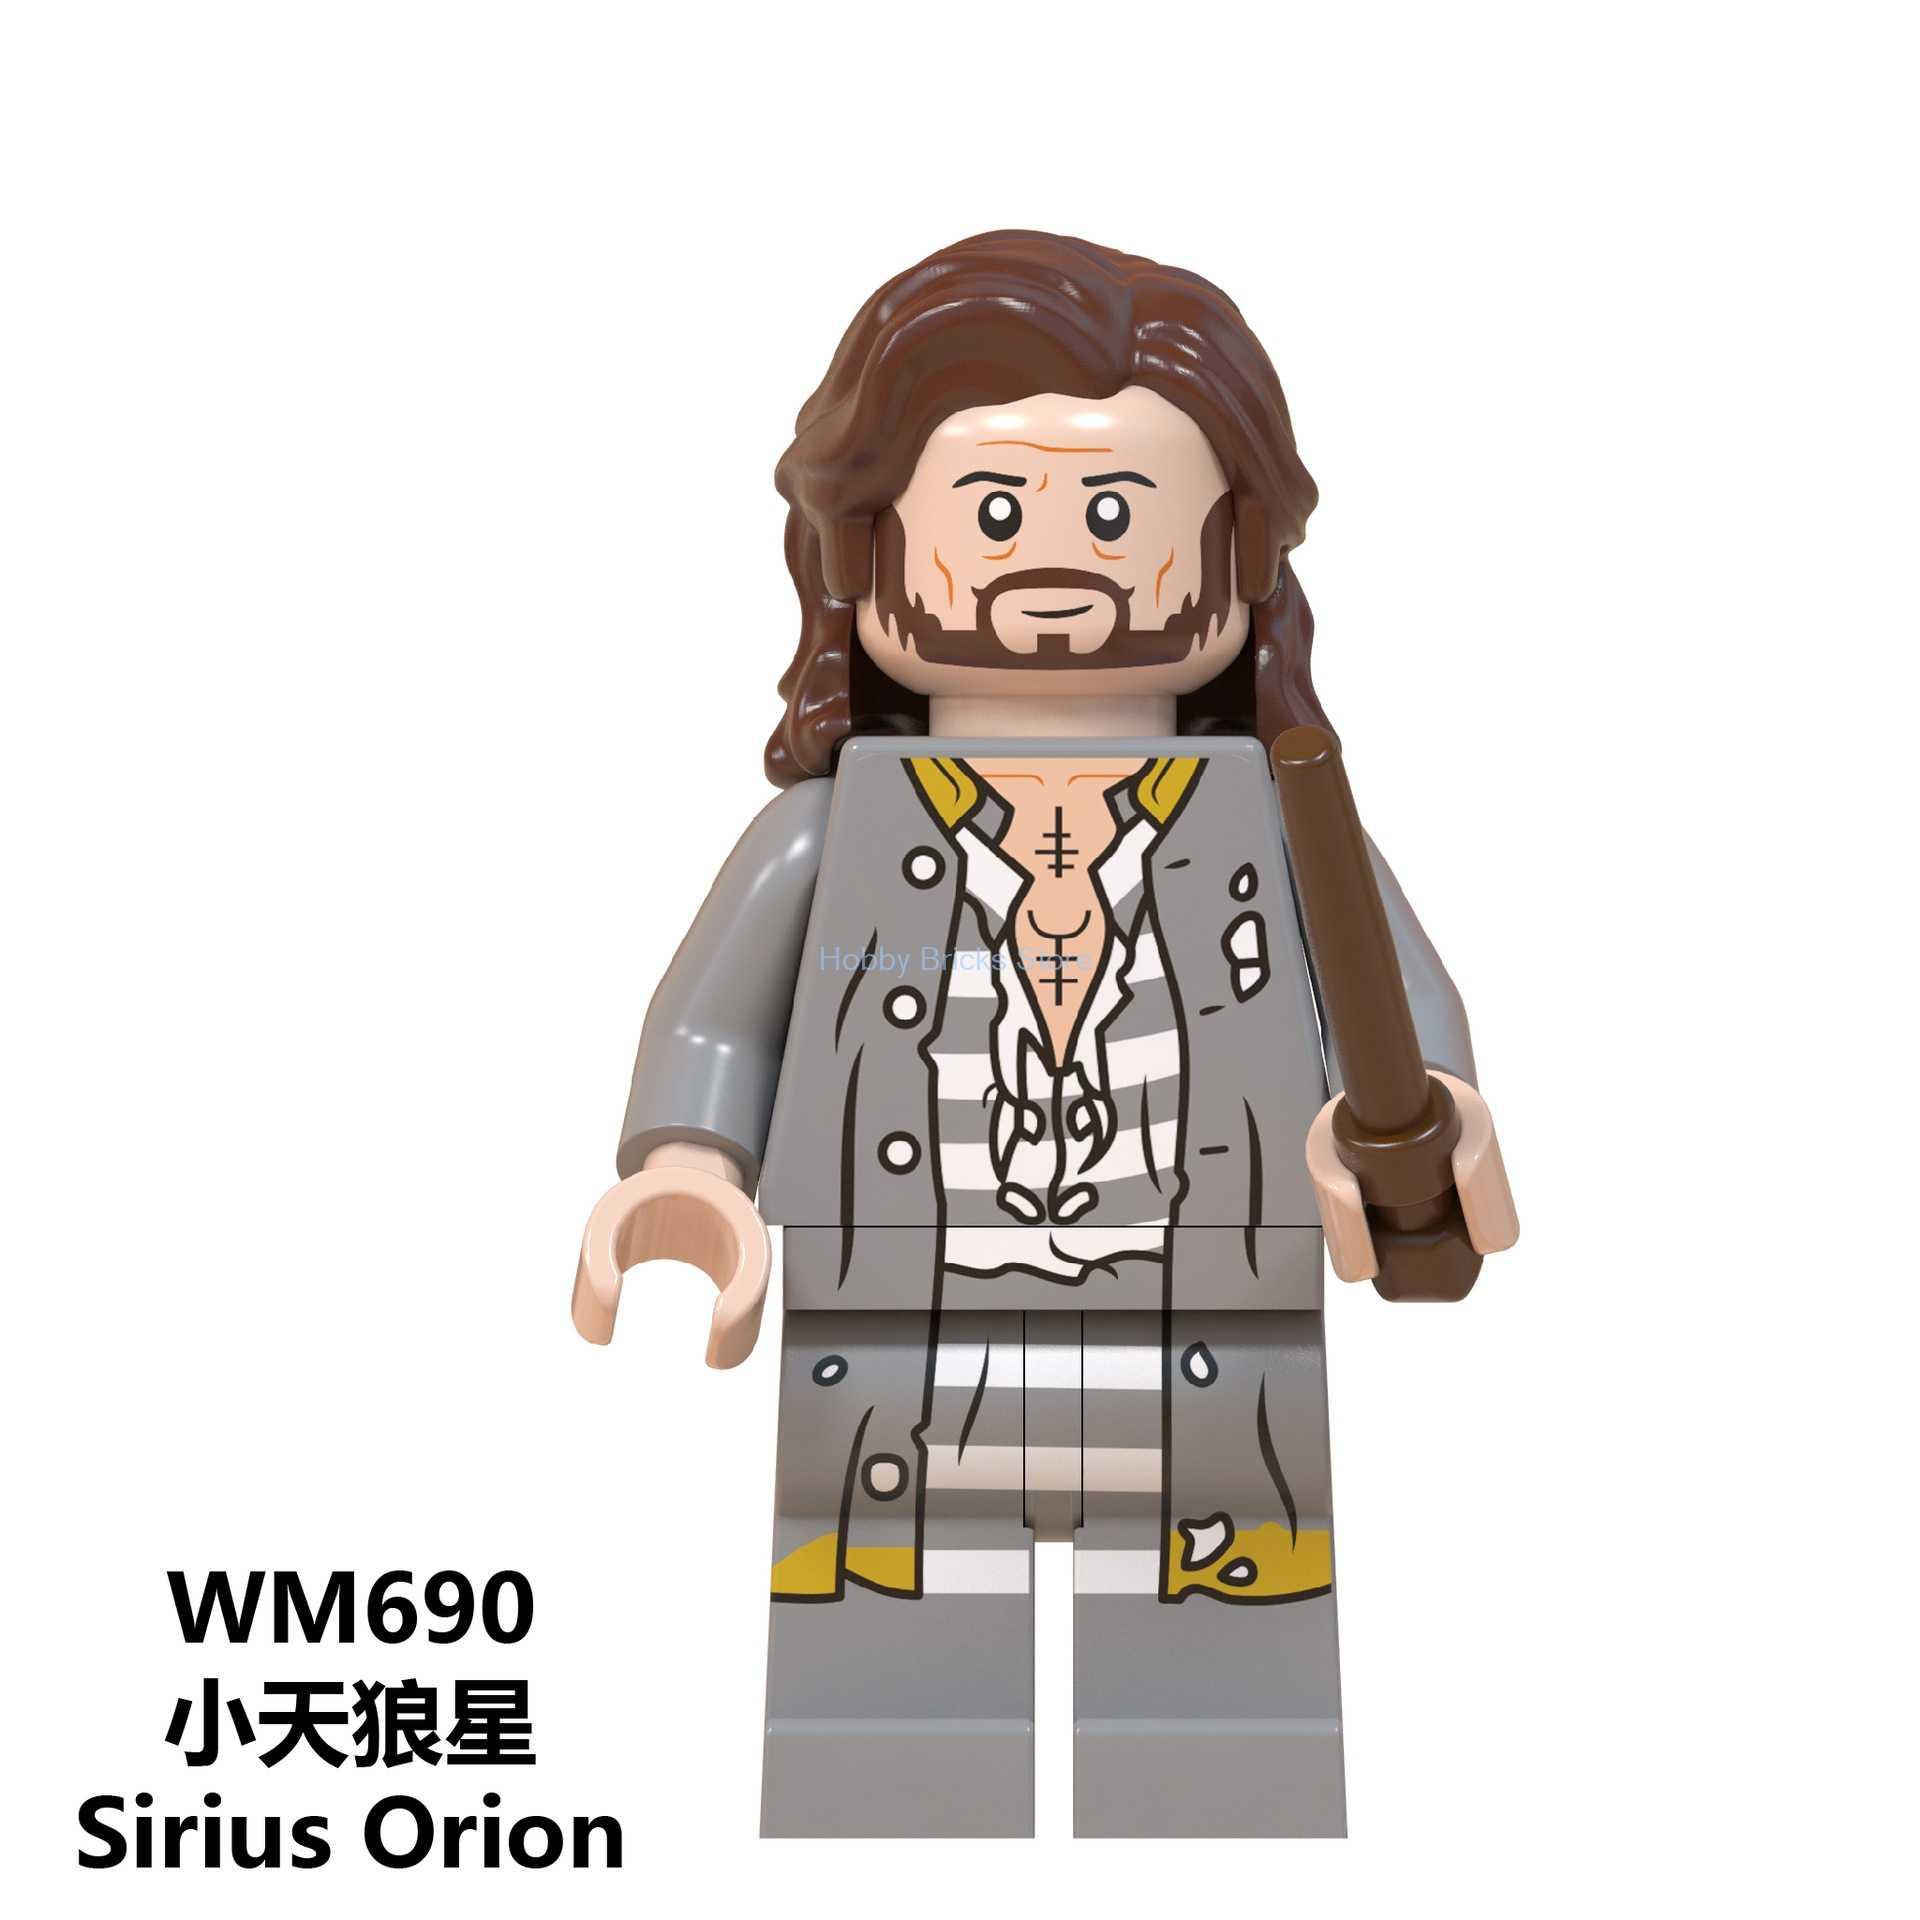 Magia Sirius Orion negro Harri Dobby Malfoy Dumbledore Minerva McGonagall Snape Hagrid bloques de construcción de juguetes para los niños